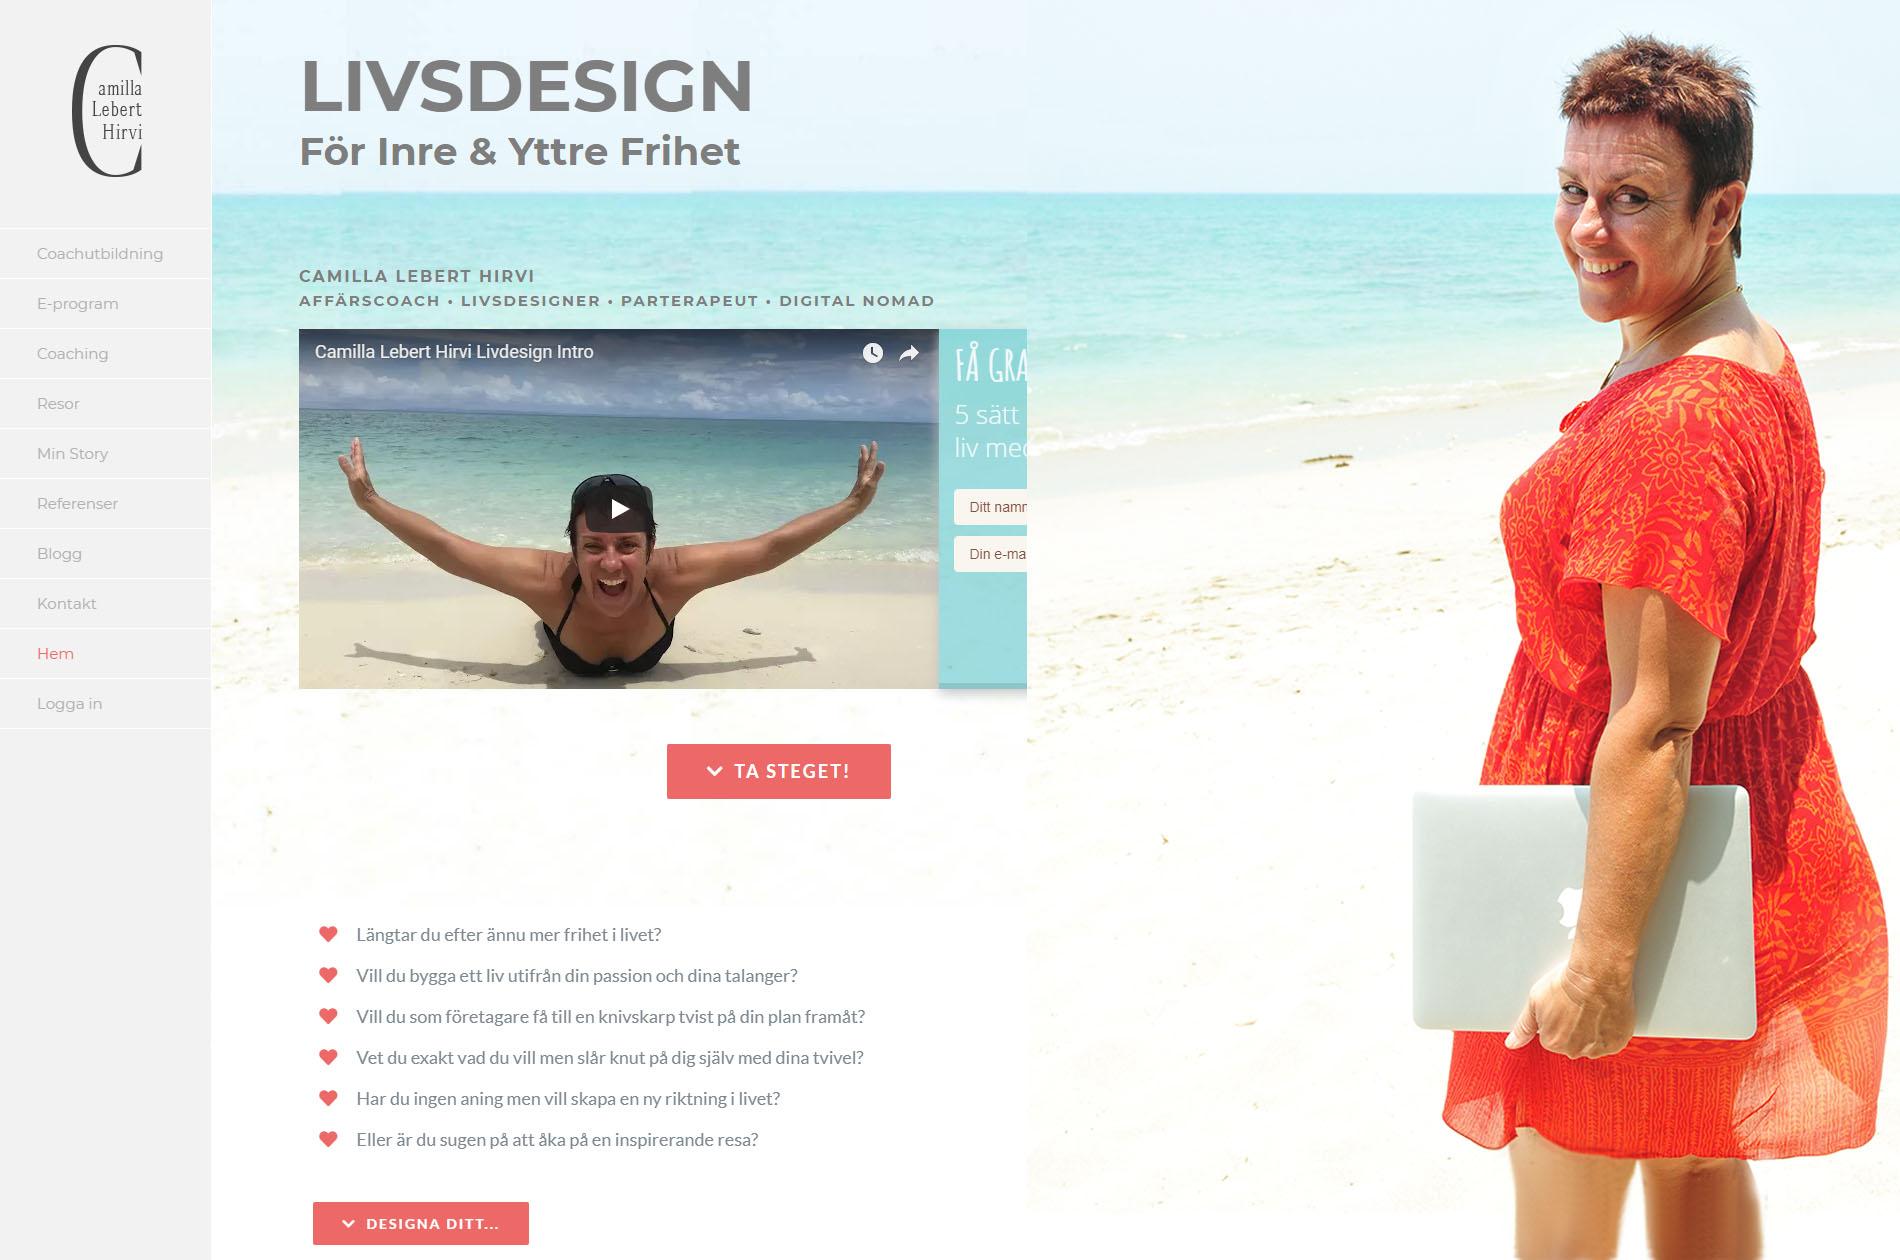 Webbdesign Camilla Lebert Hirvi Livsdesign